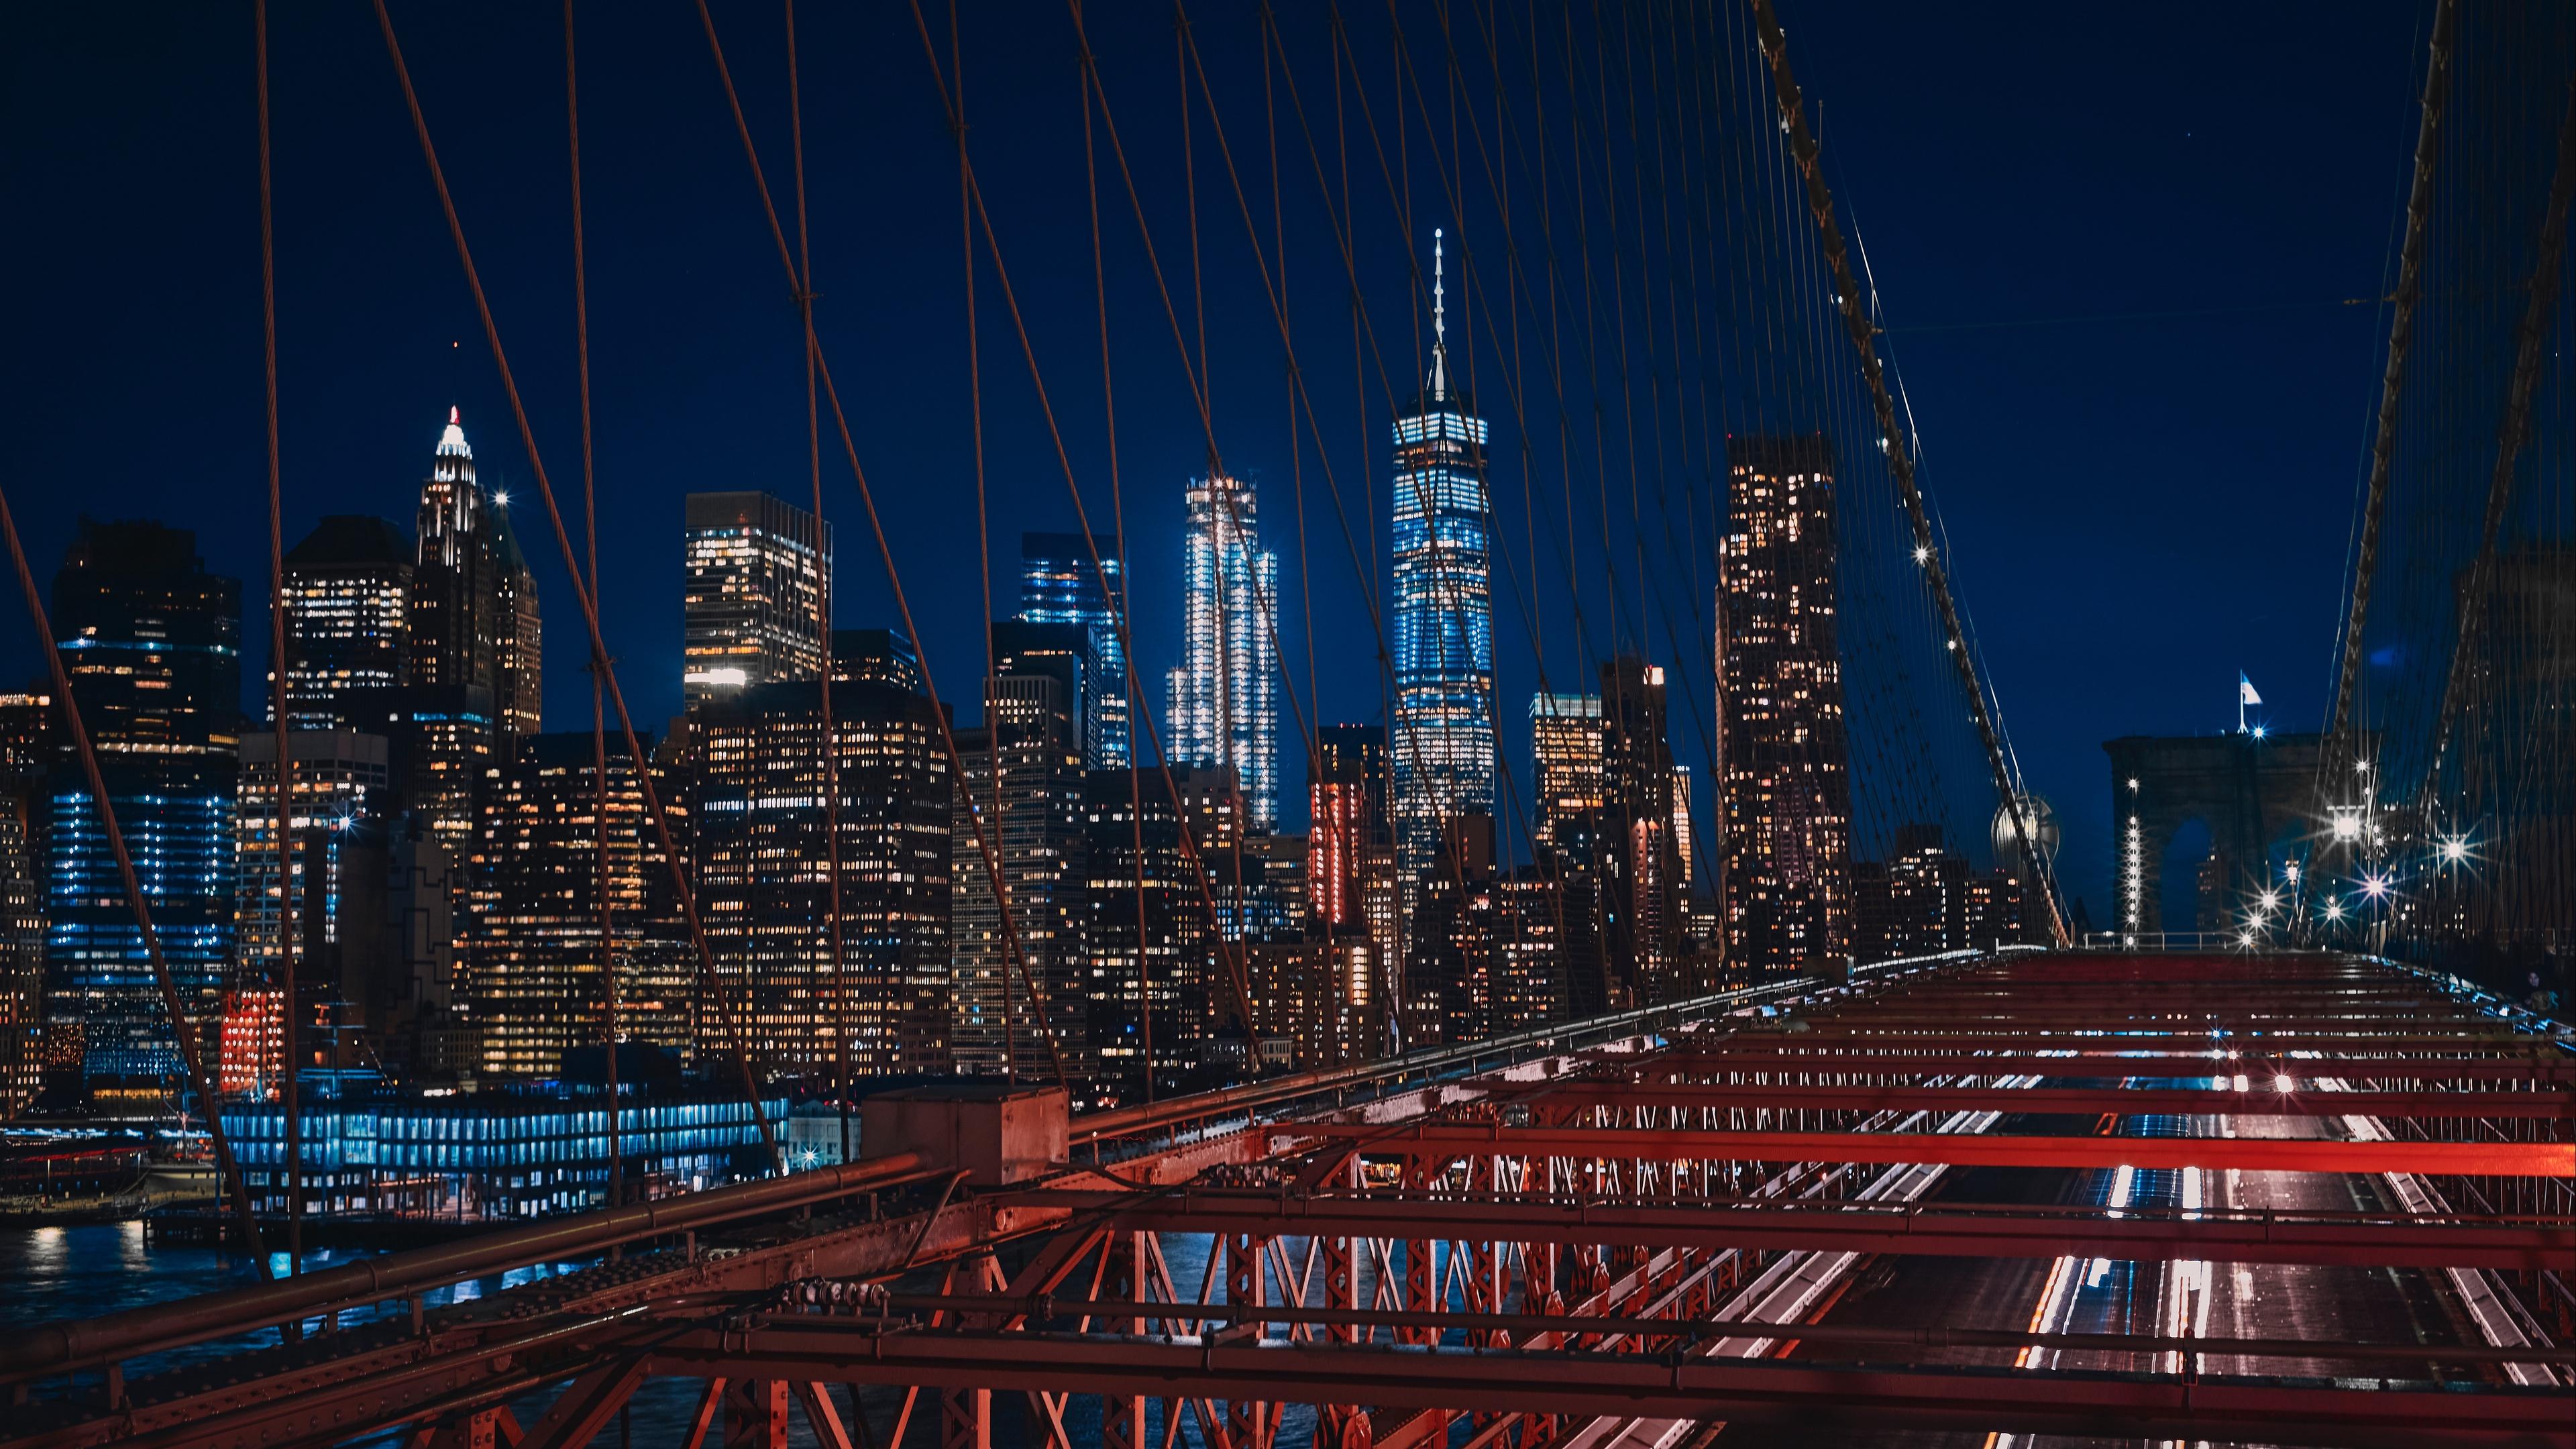 new york brooklyn bridge usa 4k 1538068828 - new york, brooklyn, bridge, usa 4k - new york, Brooklyn, bridge